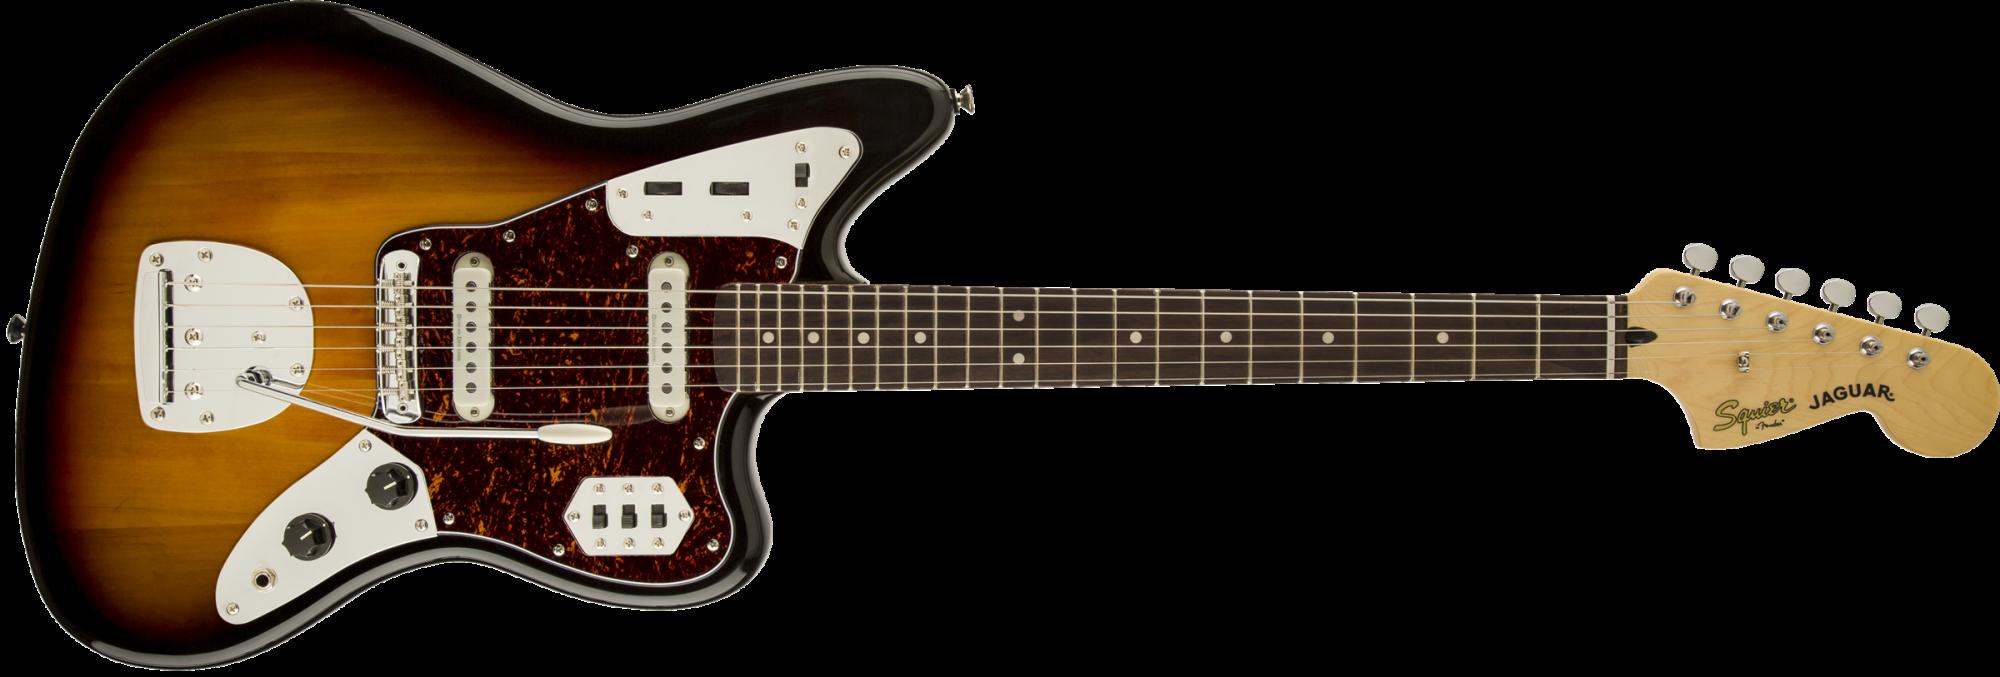 Squier Vintage Modified Jaguar Guitar - Rosewood Fingerboard - 3-Color Sunburst